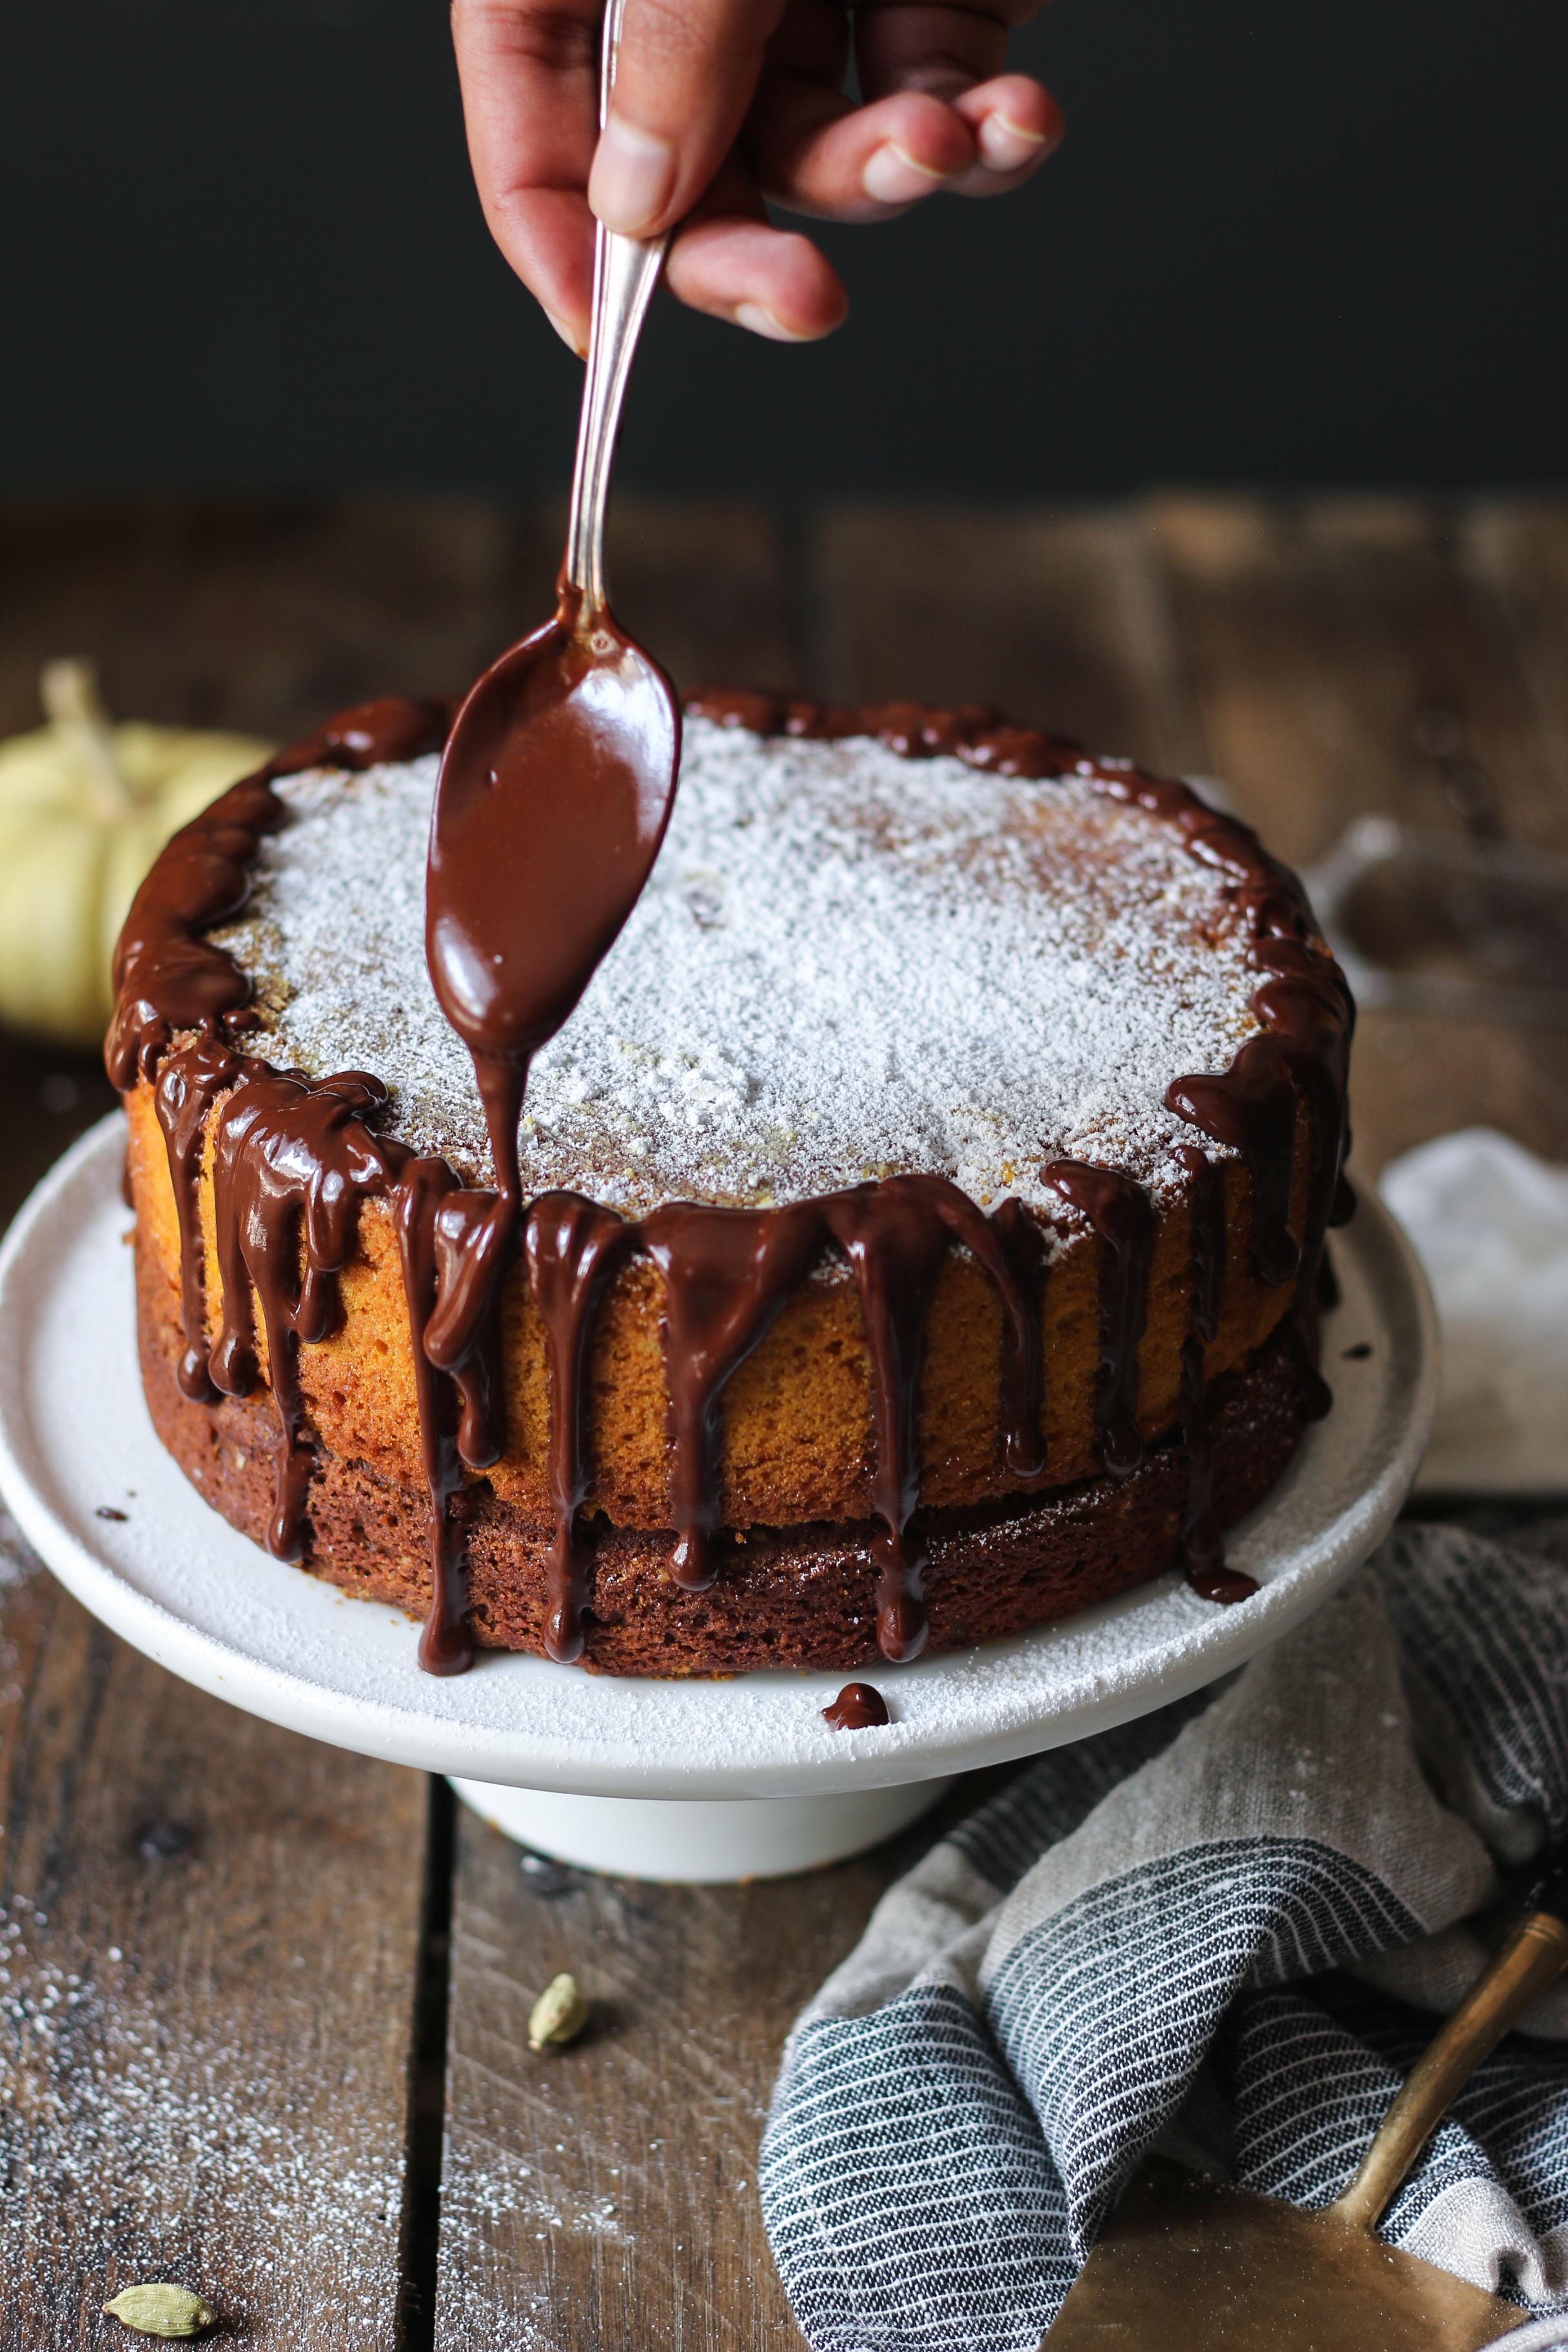 PUMPKIN CAKE - Brown Butter Pumpkin Chocolate Cake with Saffron and Cardamom |foodfashionparty| #pumpkincake